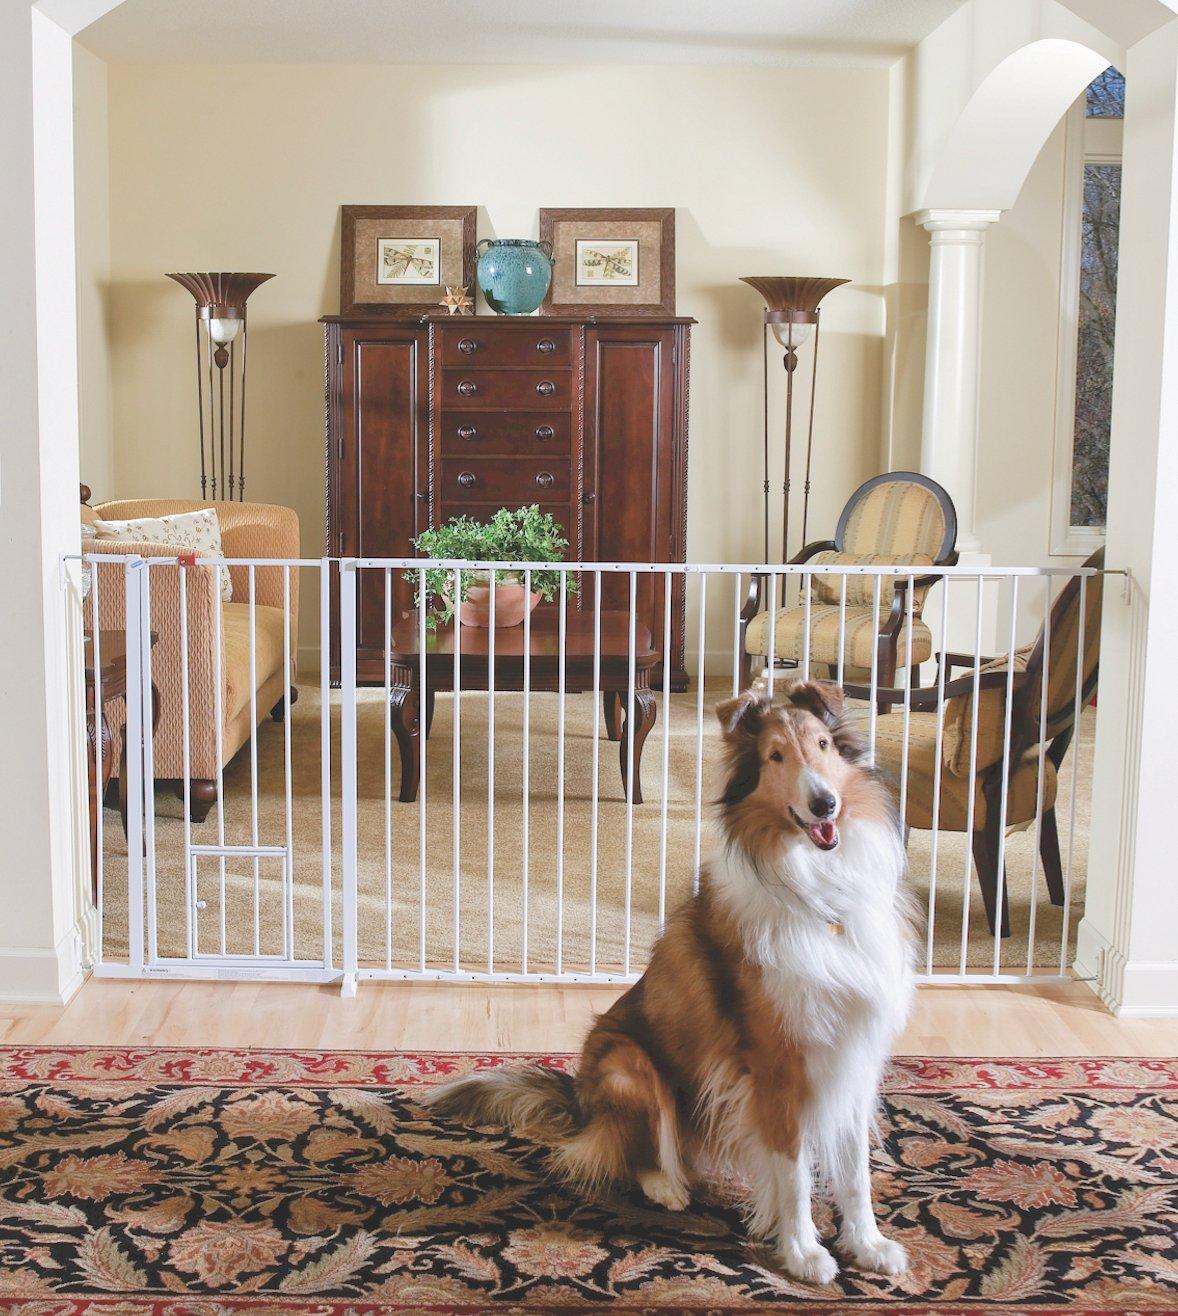 Amazon.com : Carlson Maxi Extra Tall Pet Gate, Expands 51-59 ...